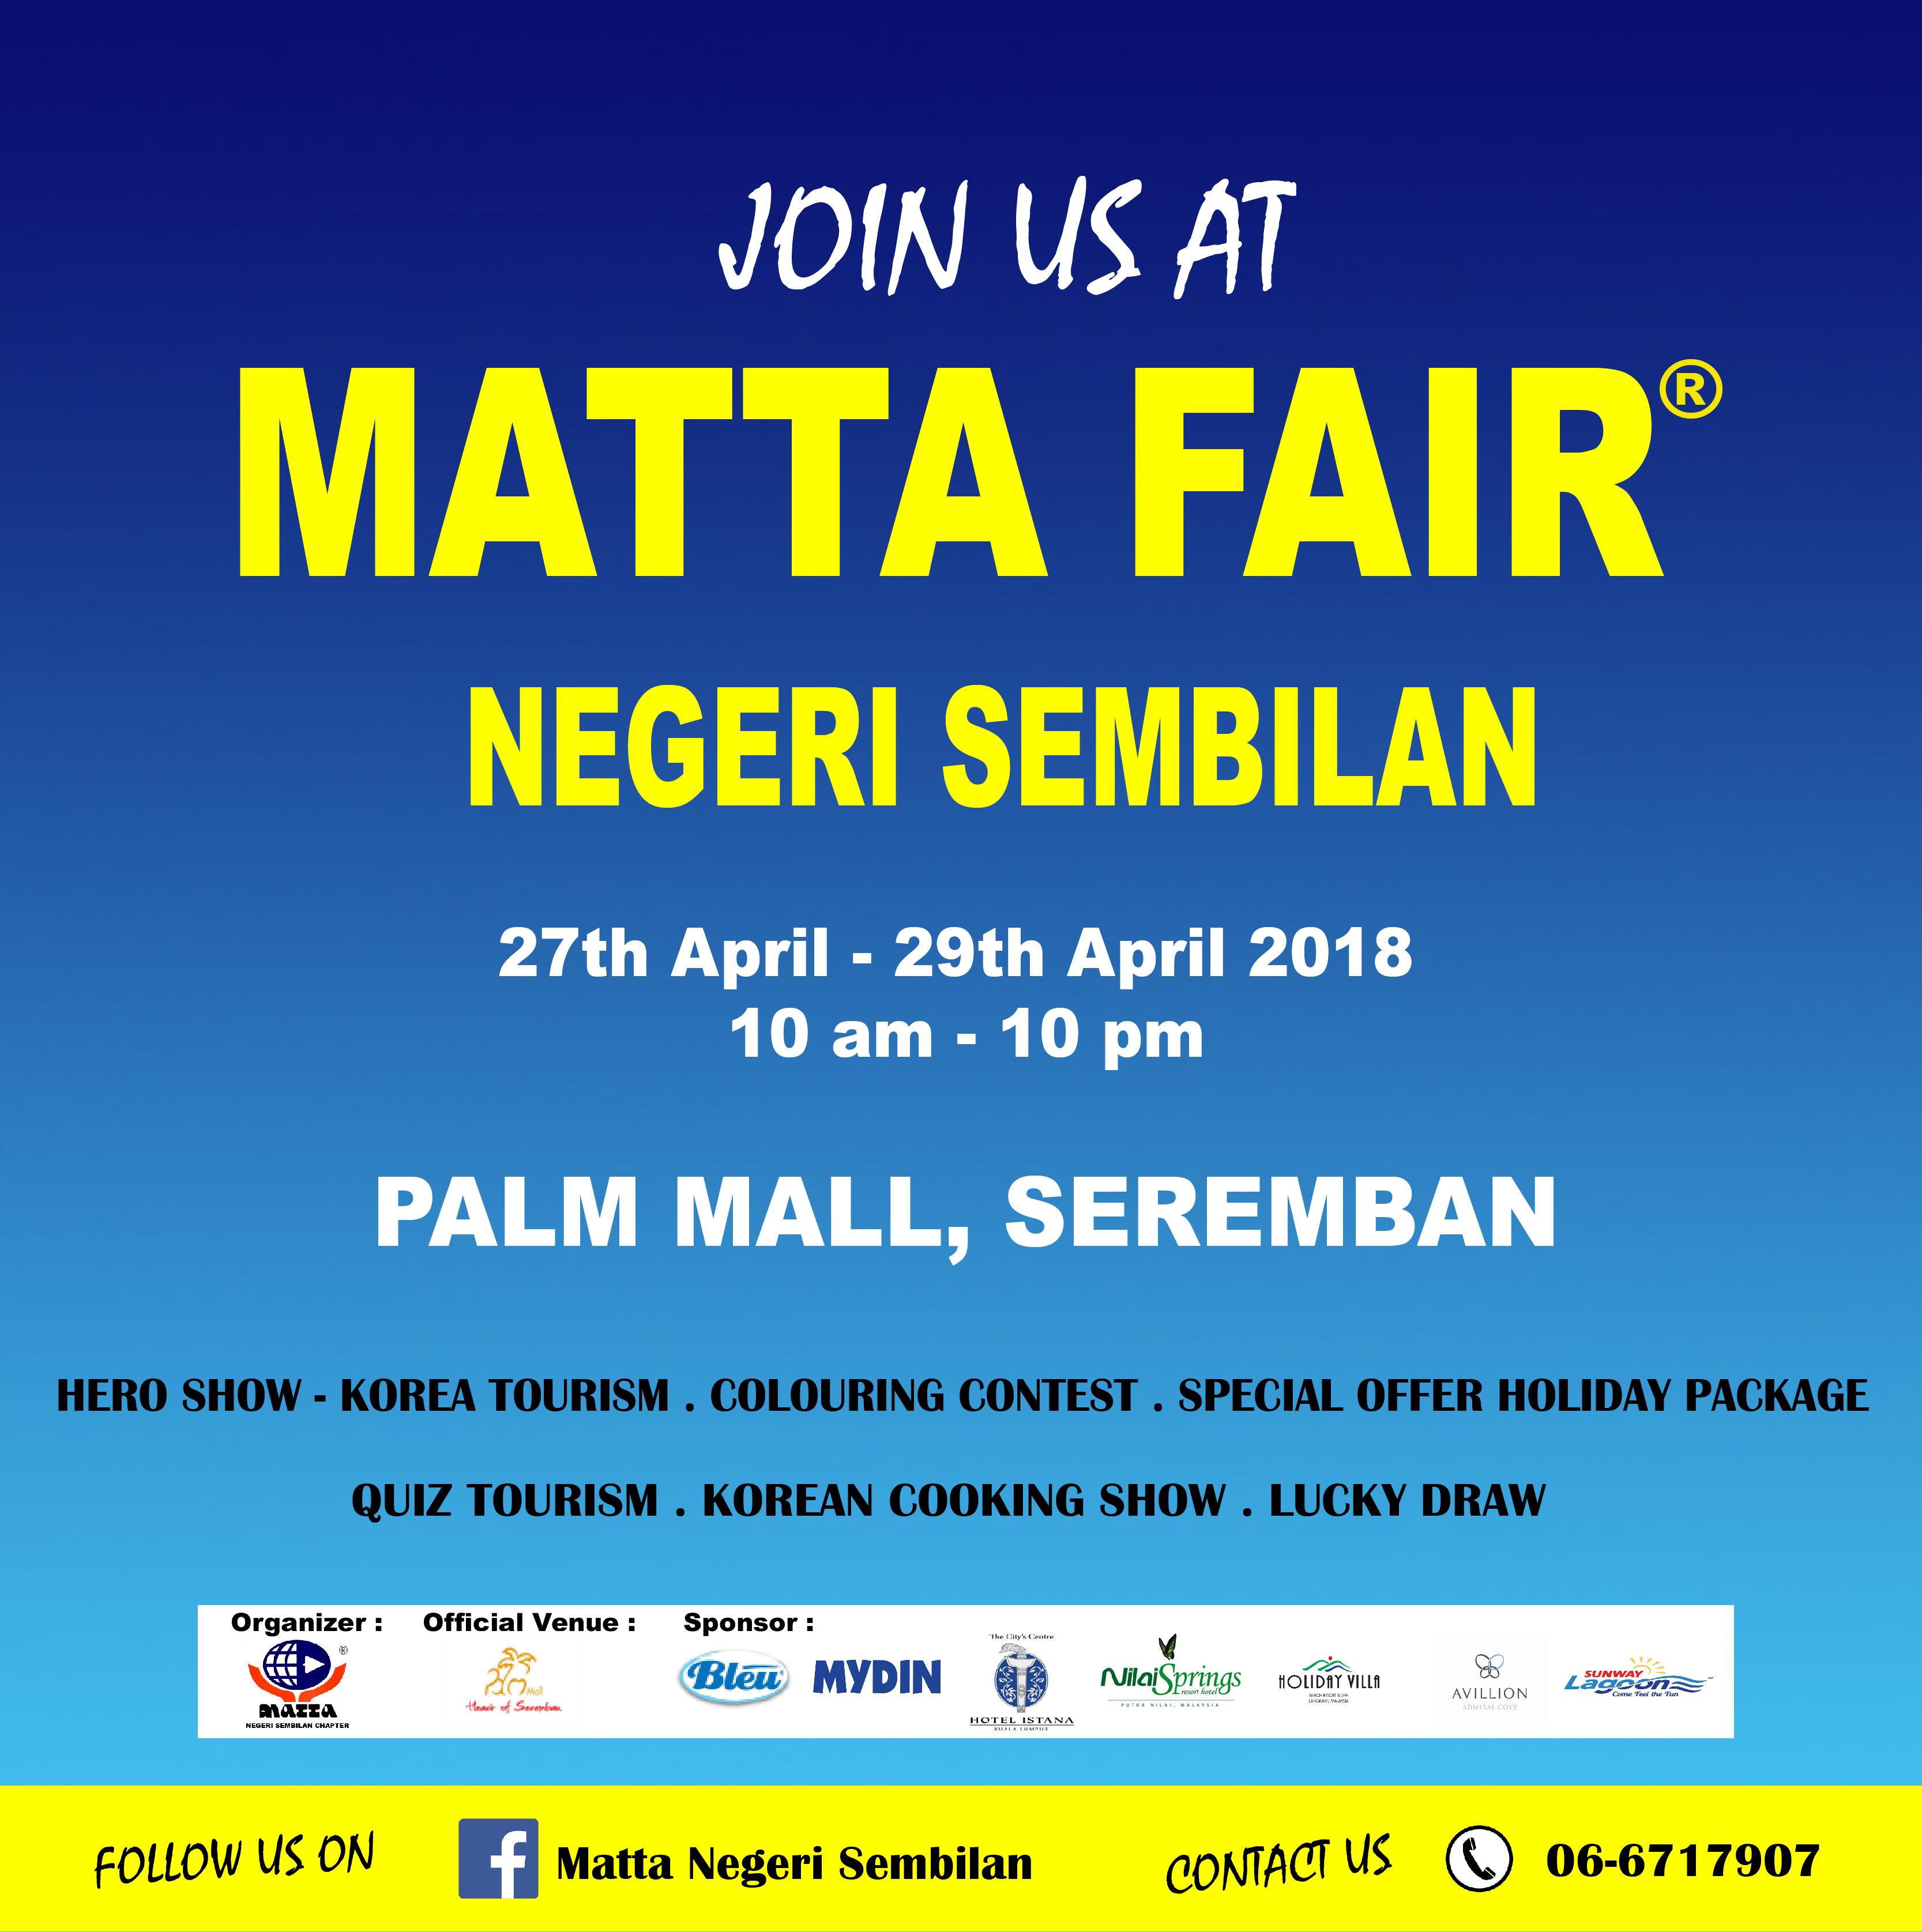 Matta Fair Negeri Sembilan